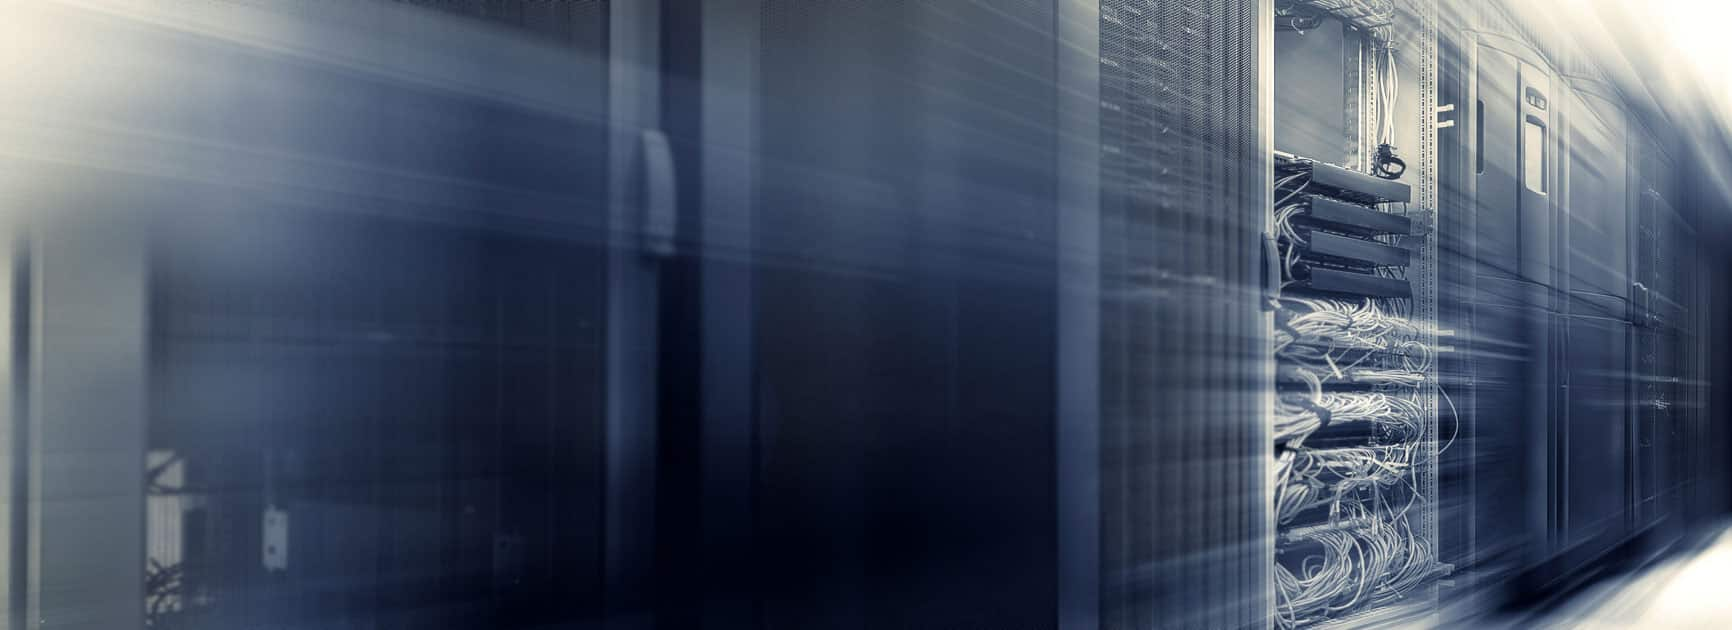 Soluzioni hardware e software mail server firewall torino